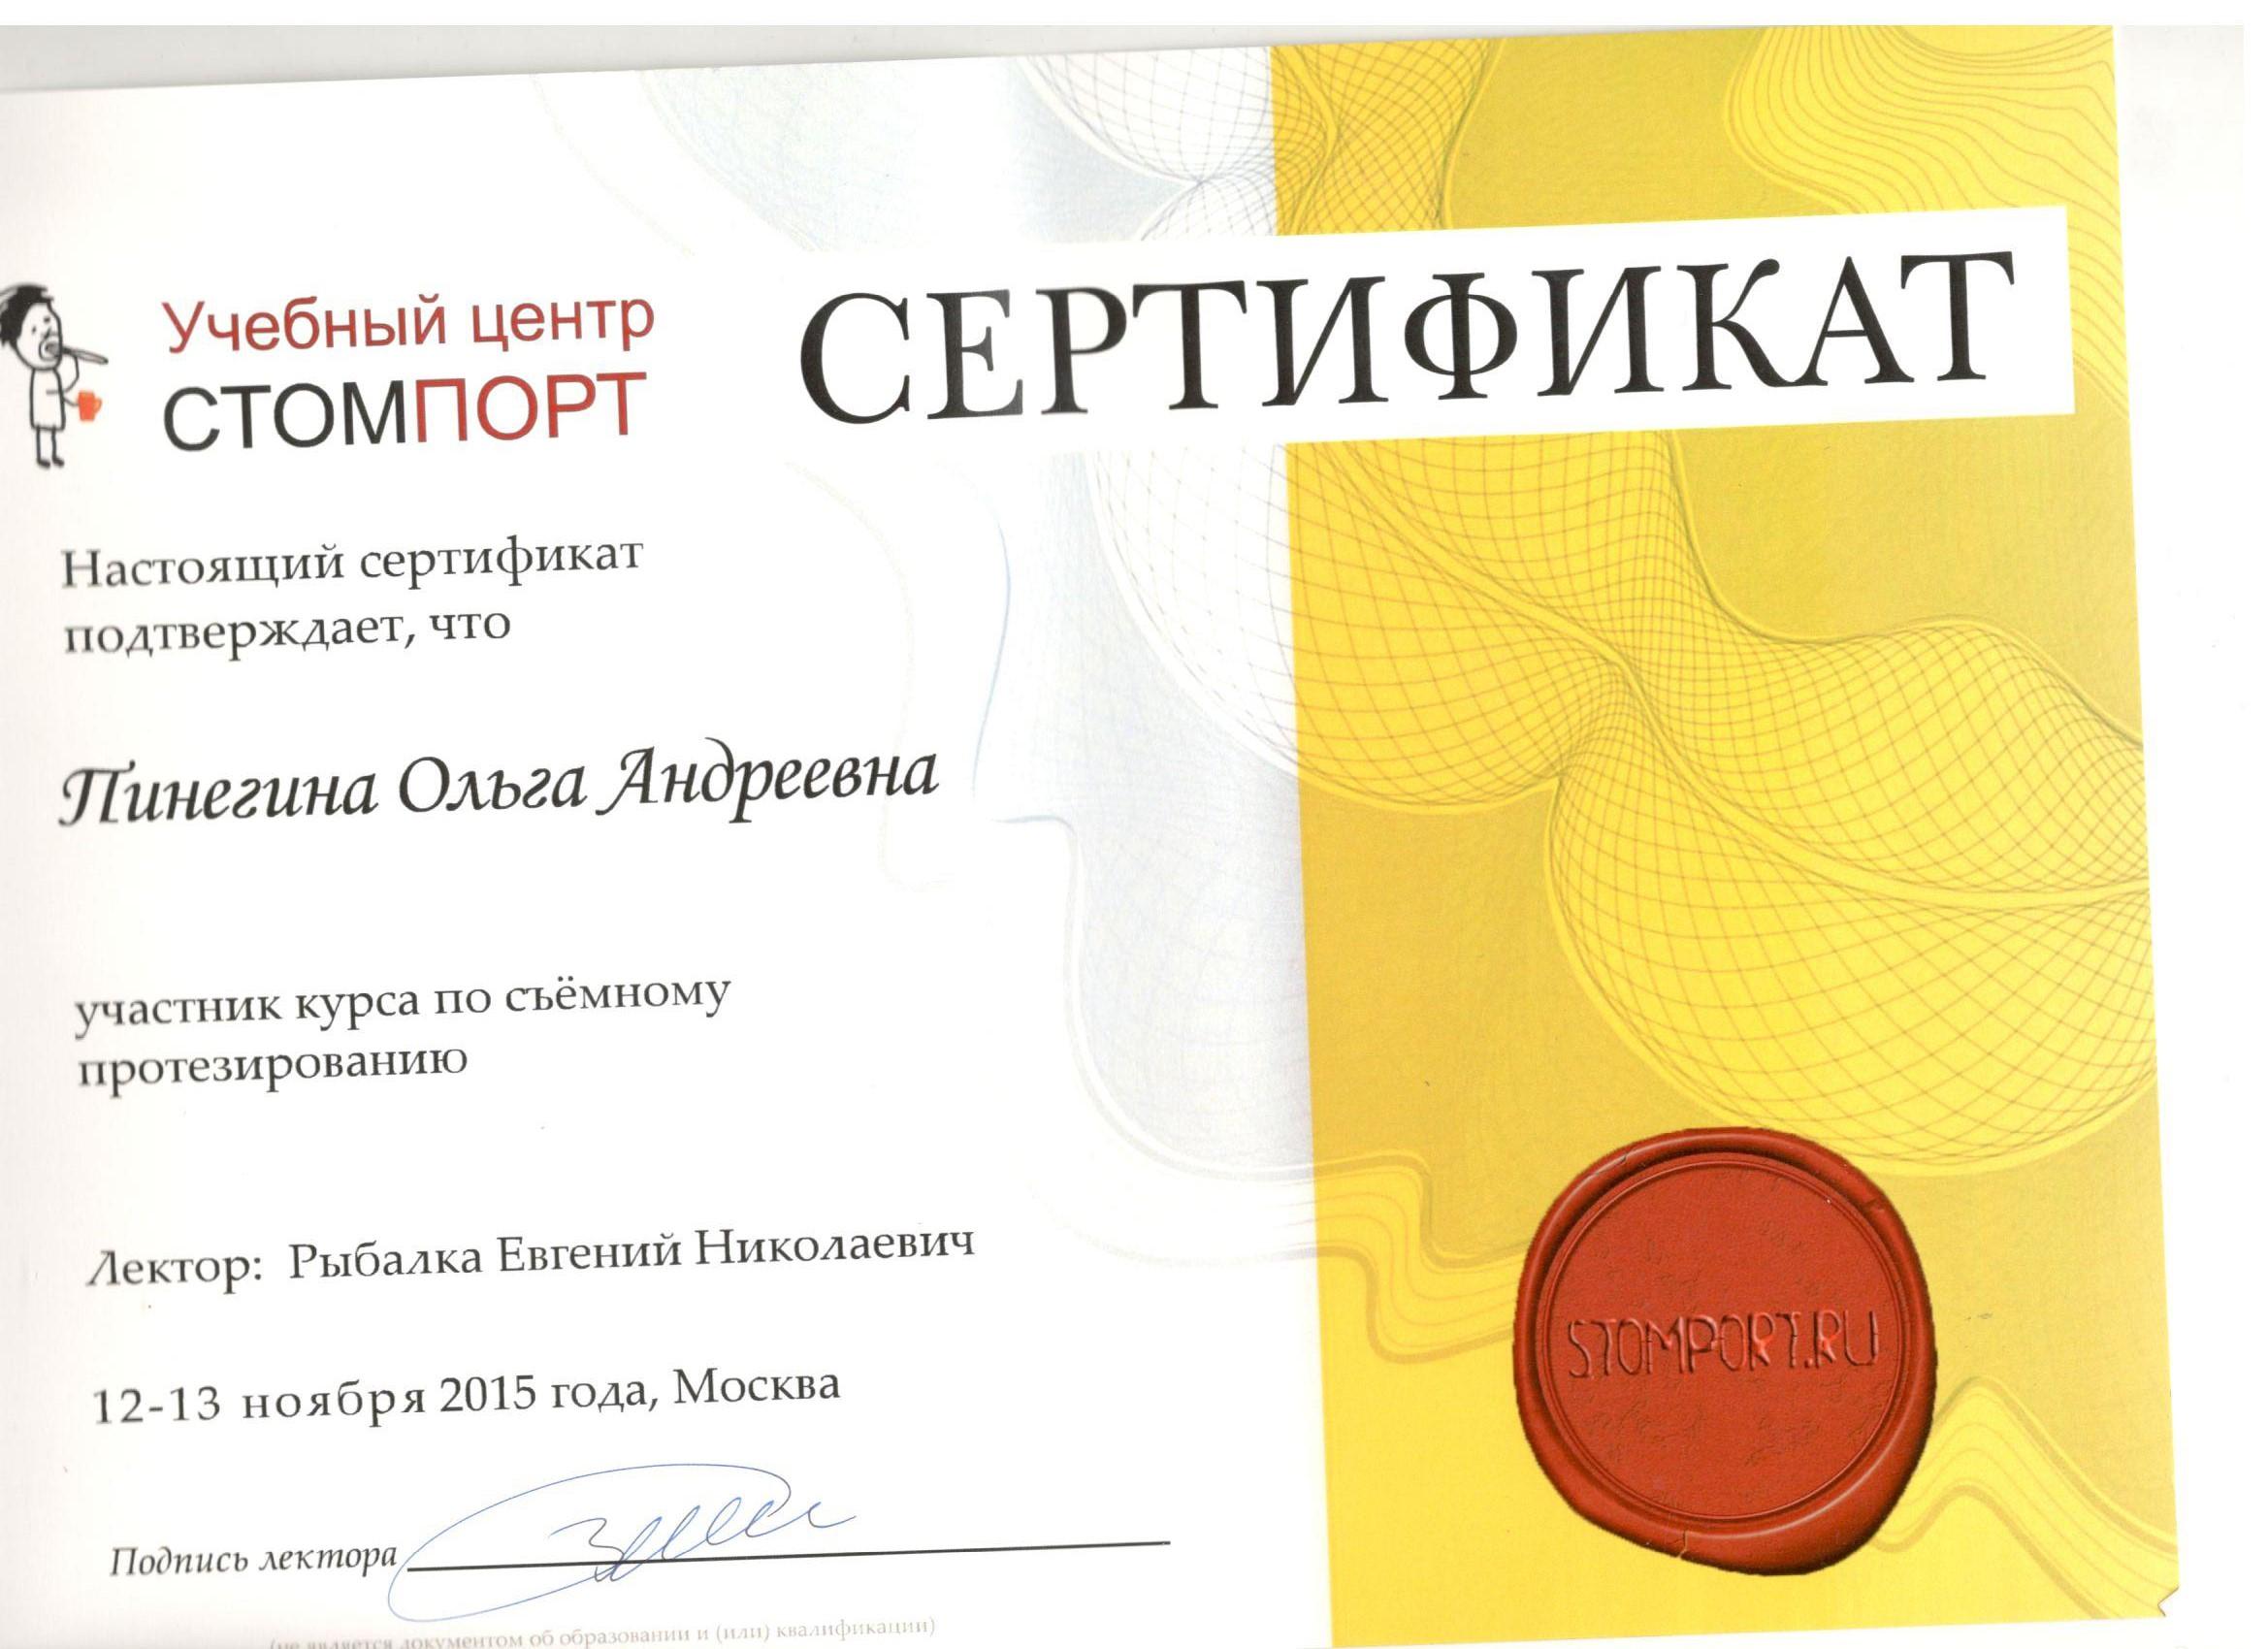 2015 г. Курс по съемному протезированию.